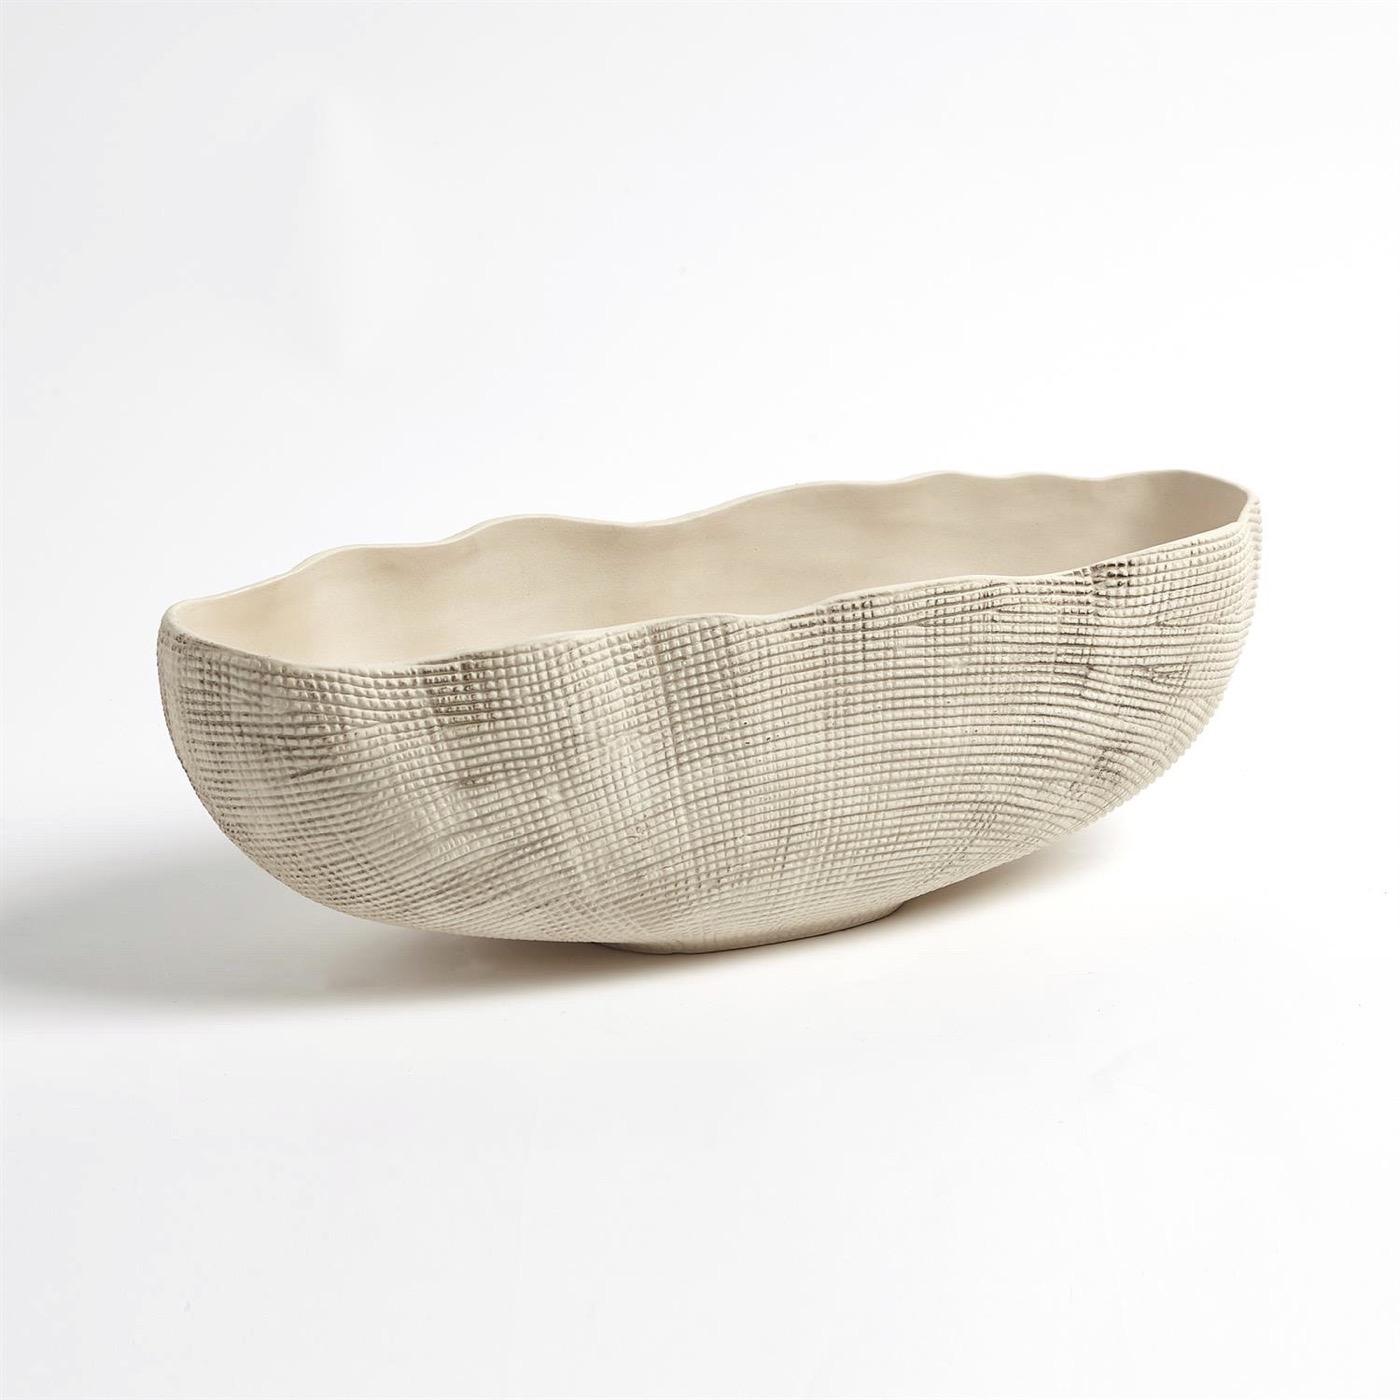 Gridley Ceramic Bowls